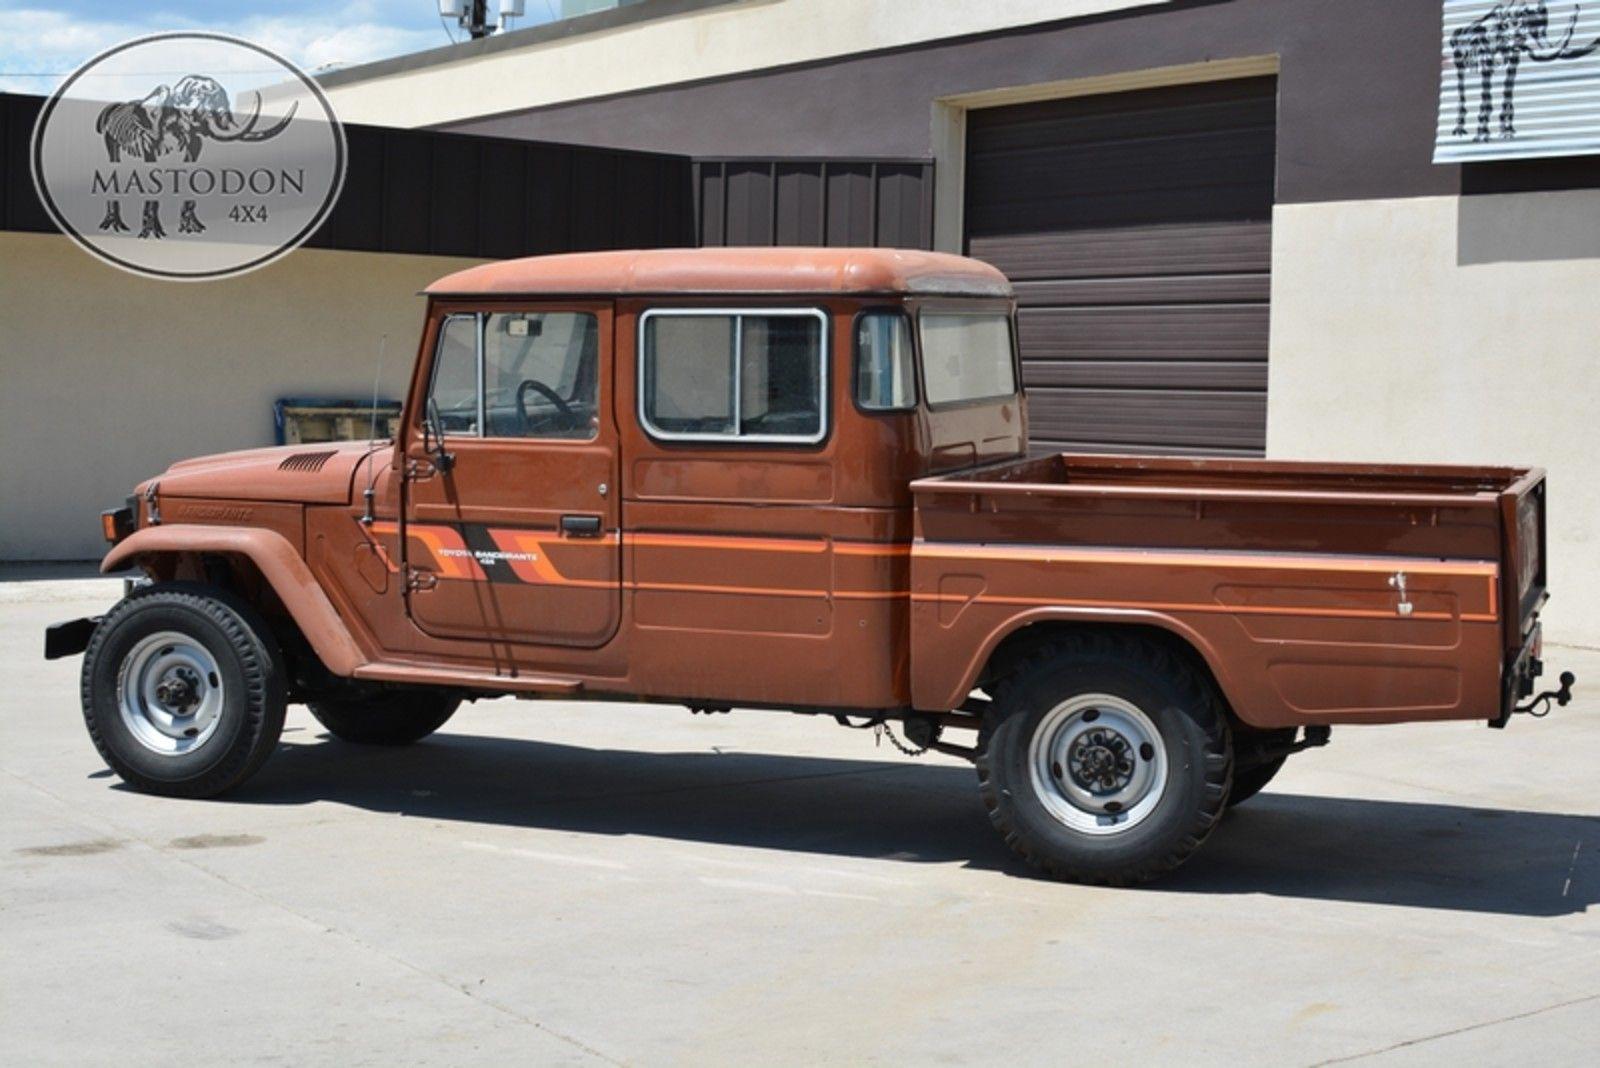 1989 Brown 4x4 Truck Fj Land Cruiser Fj40 Fj45 For Sale Photos Technical Specifications Description Land Cruiser 4x4 Trucks Cruisers